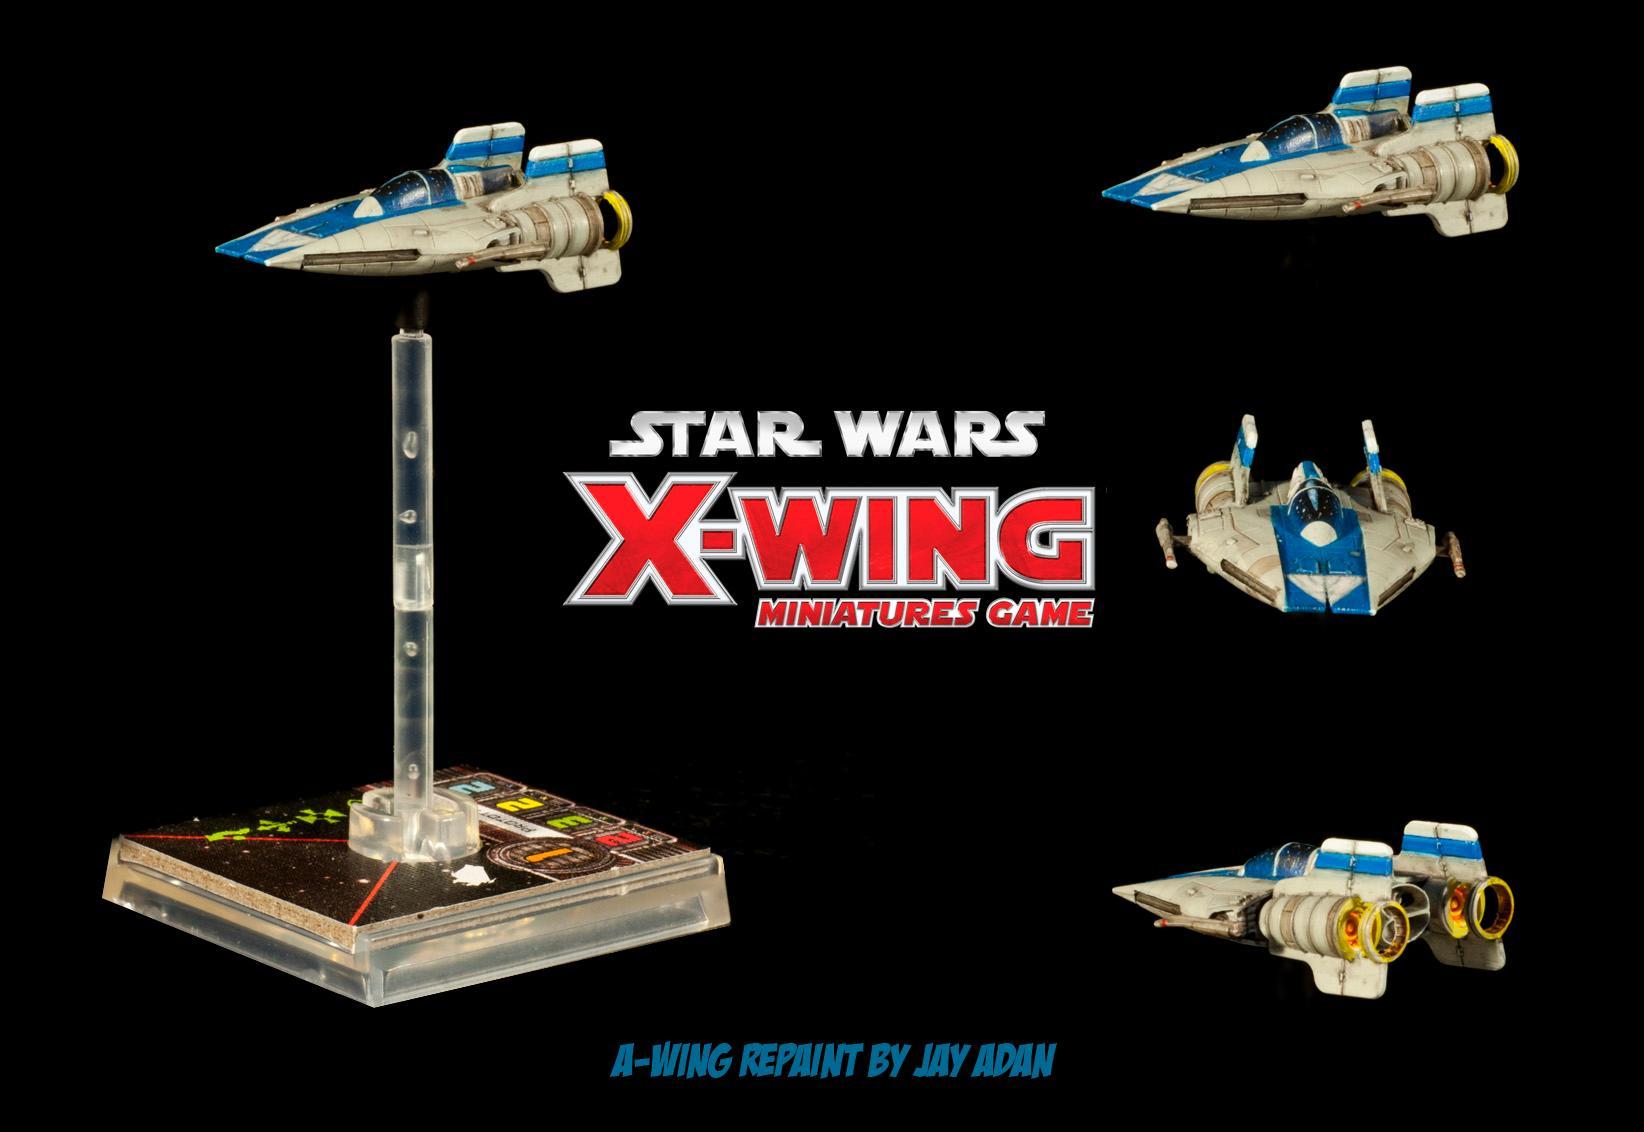 A-wing, Repaint, Star Wars, X-Wing